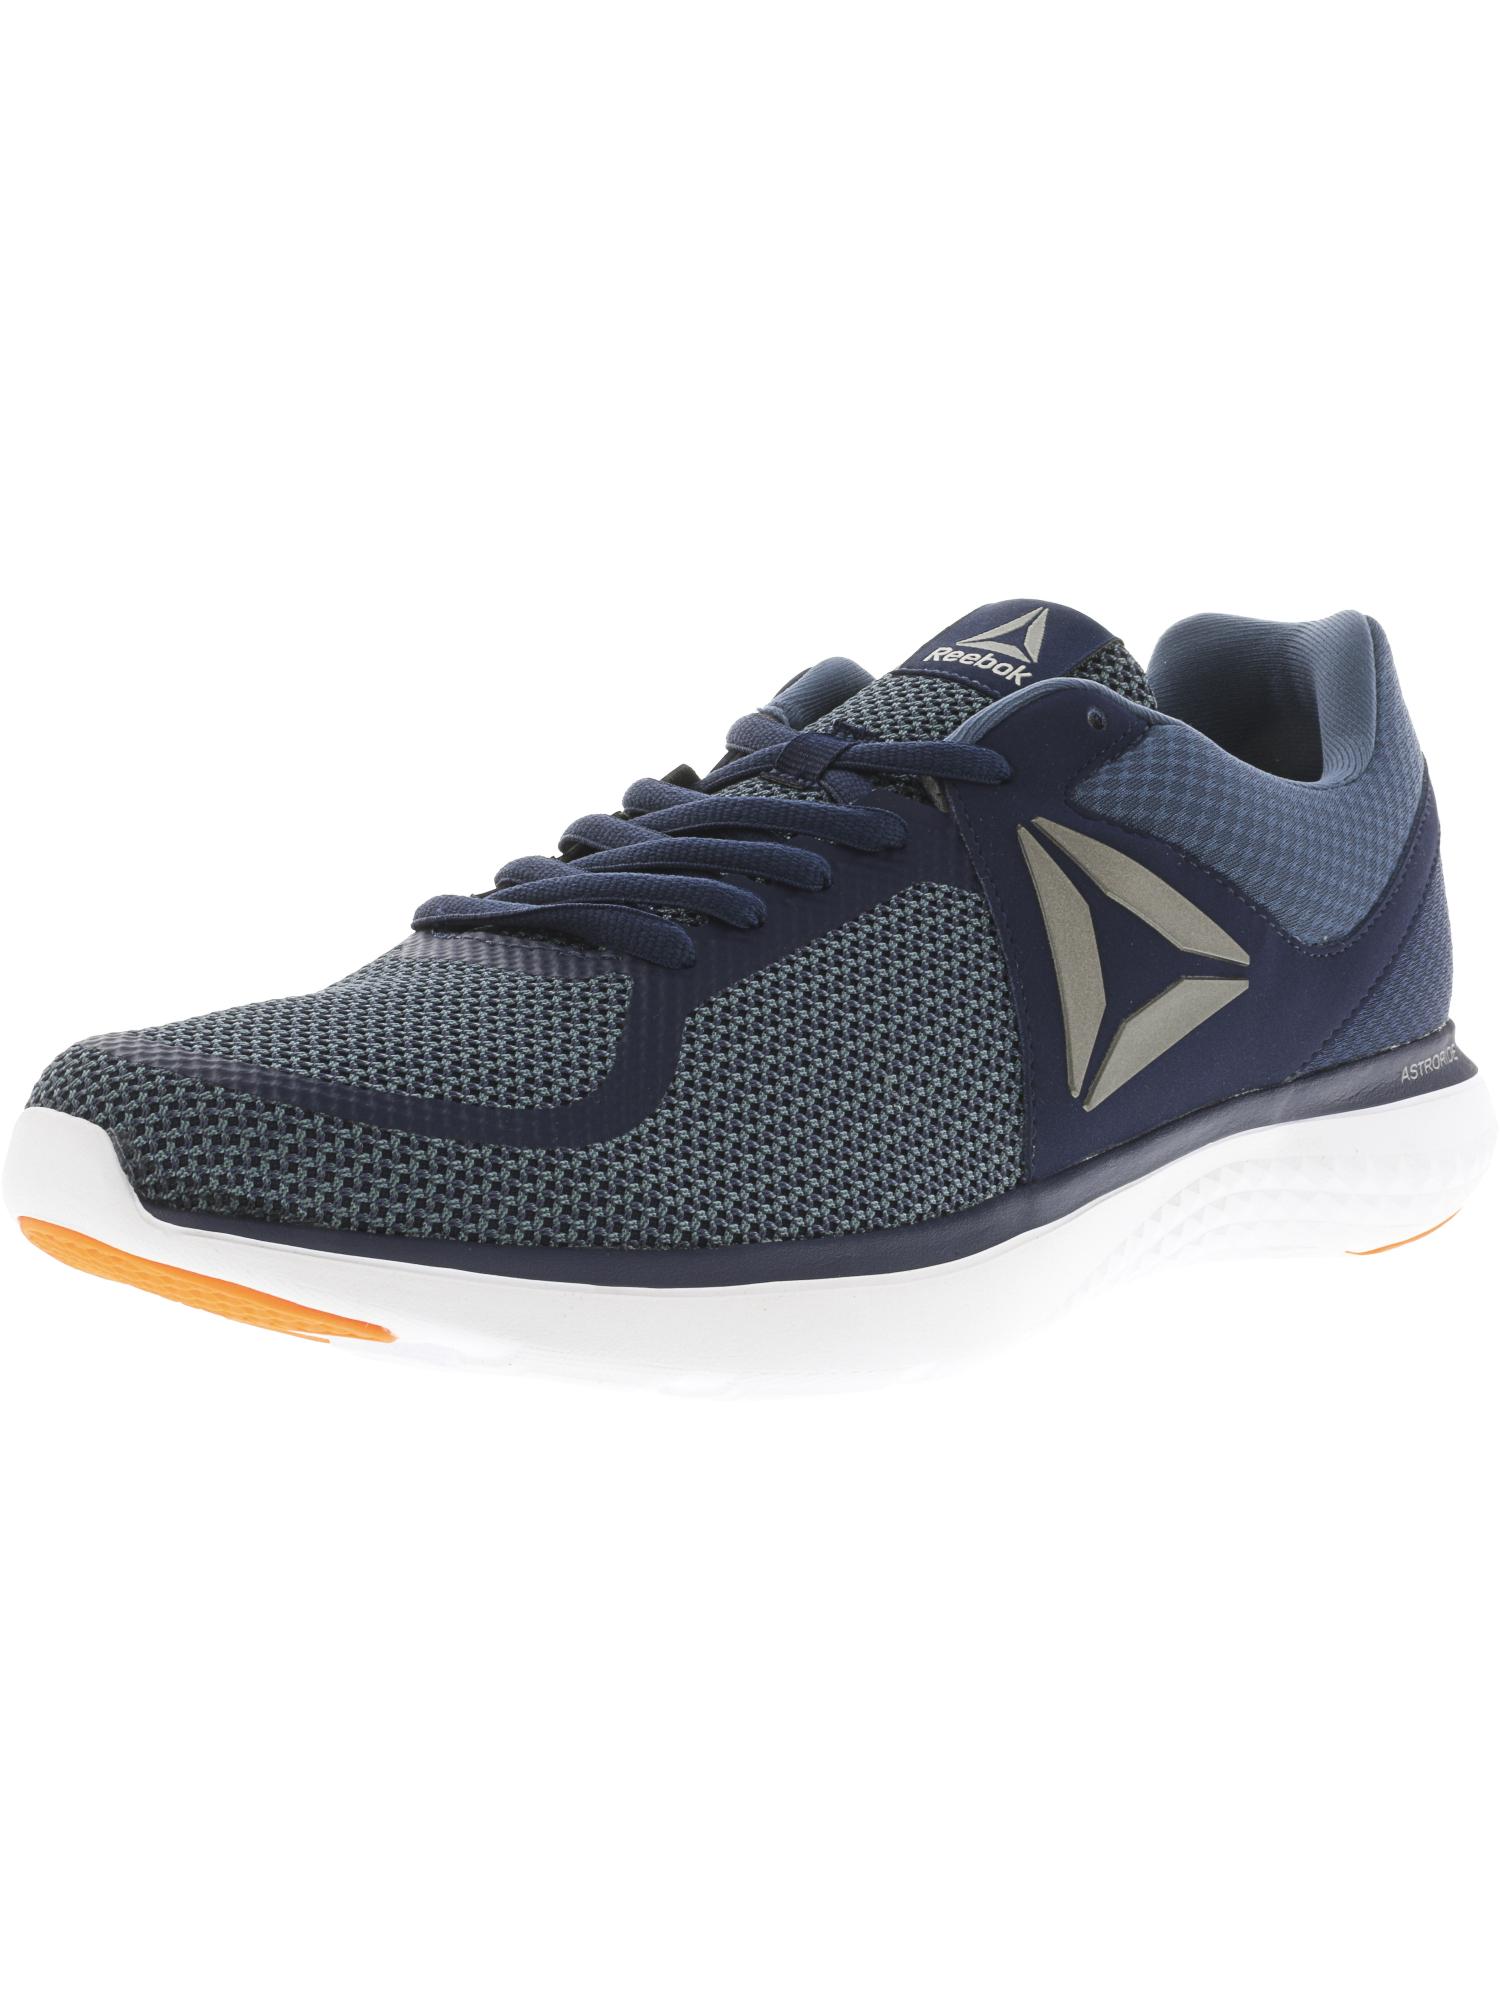 39d0be6e3ff9e Reebok Men s Astroride Run Run Run Mt Ankle-High Running Shoe e22efb ...